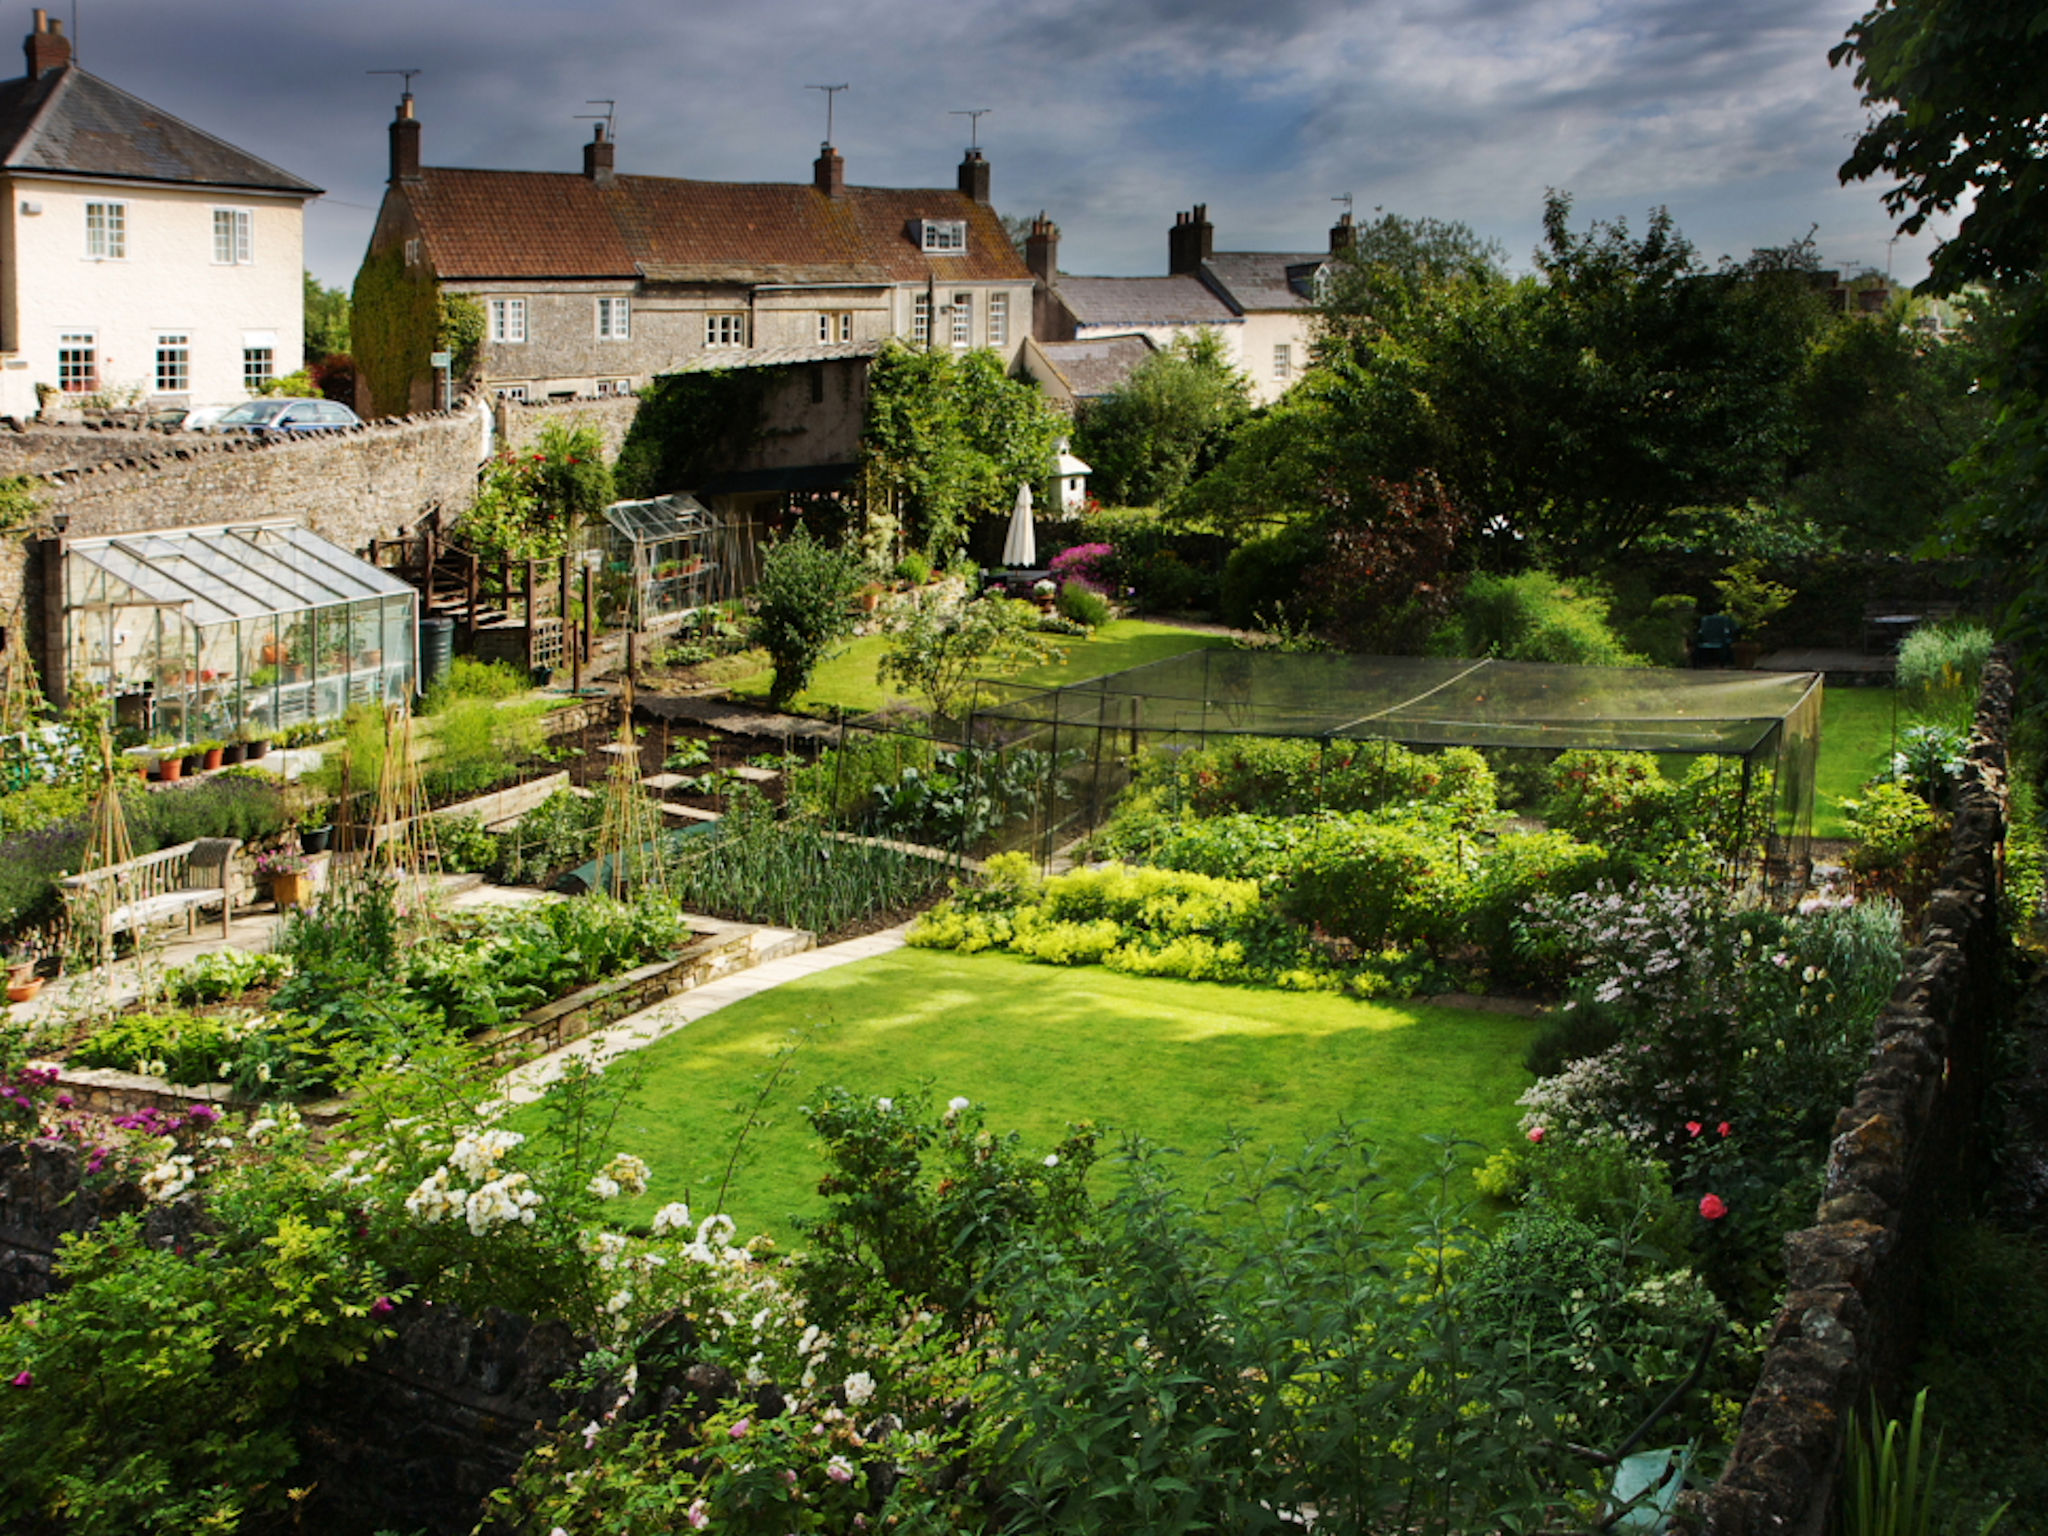 View over the vegetable garden